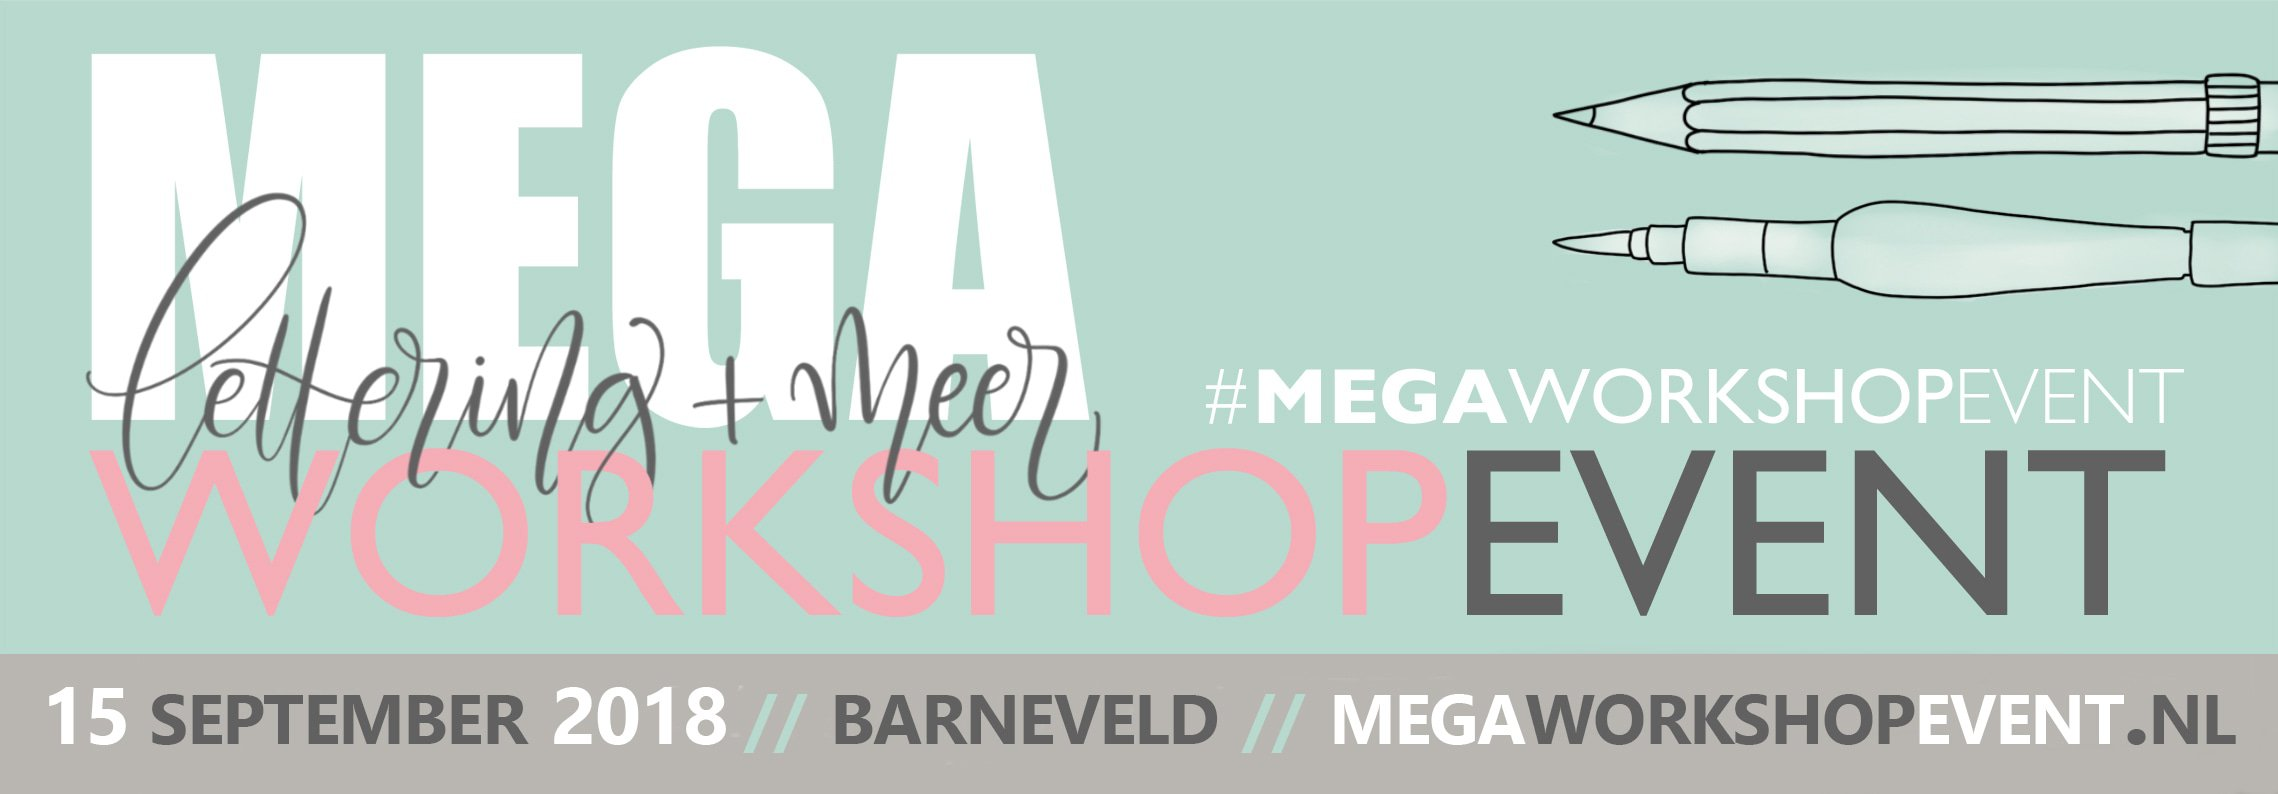 Mega workshop event Barneveld